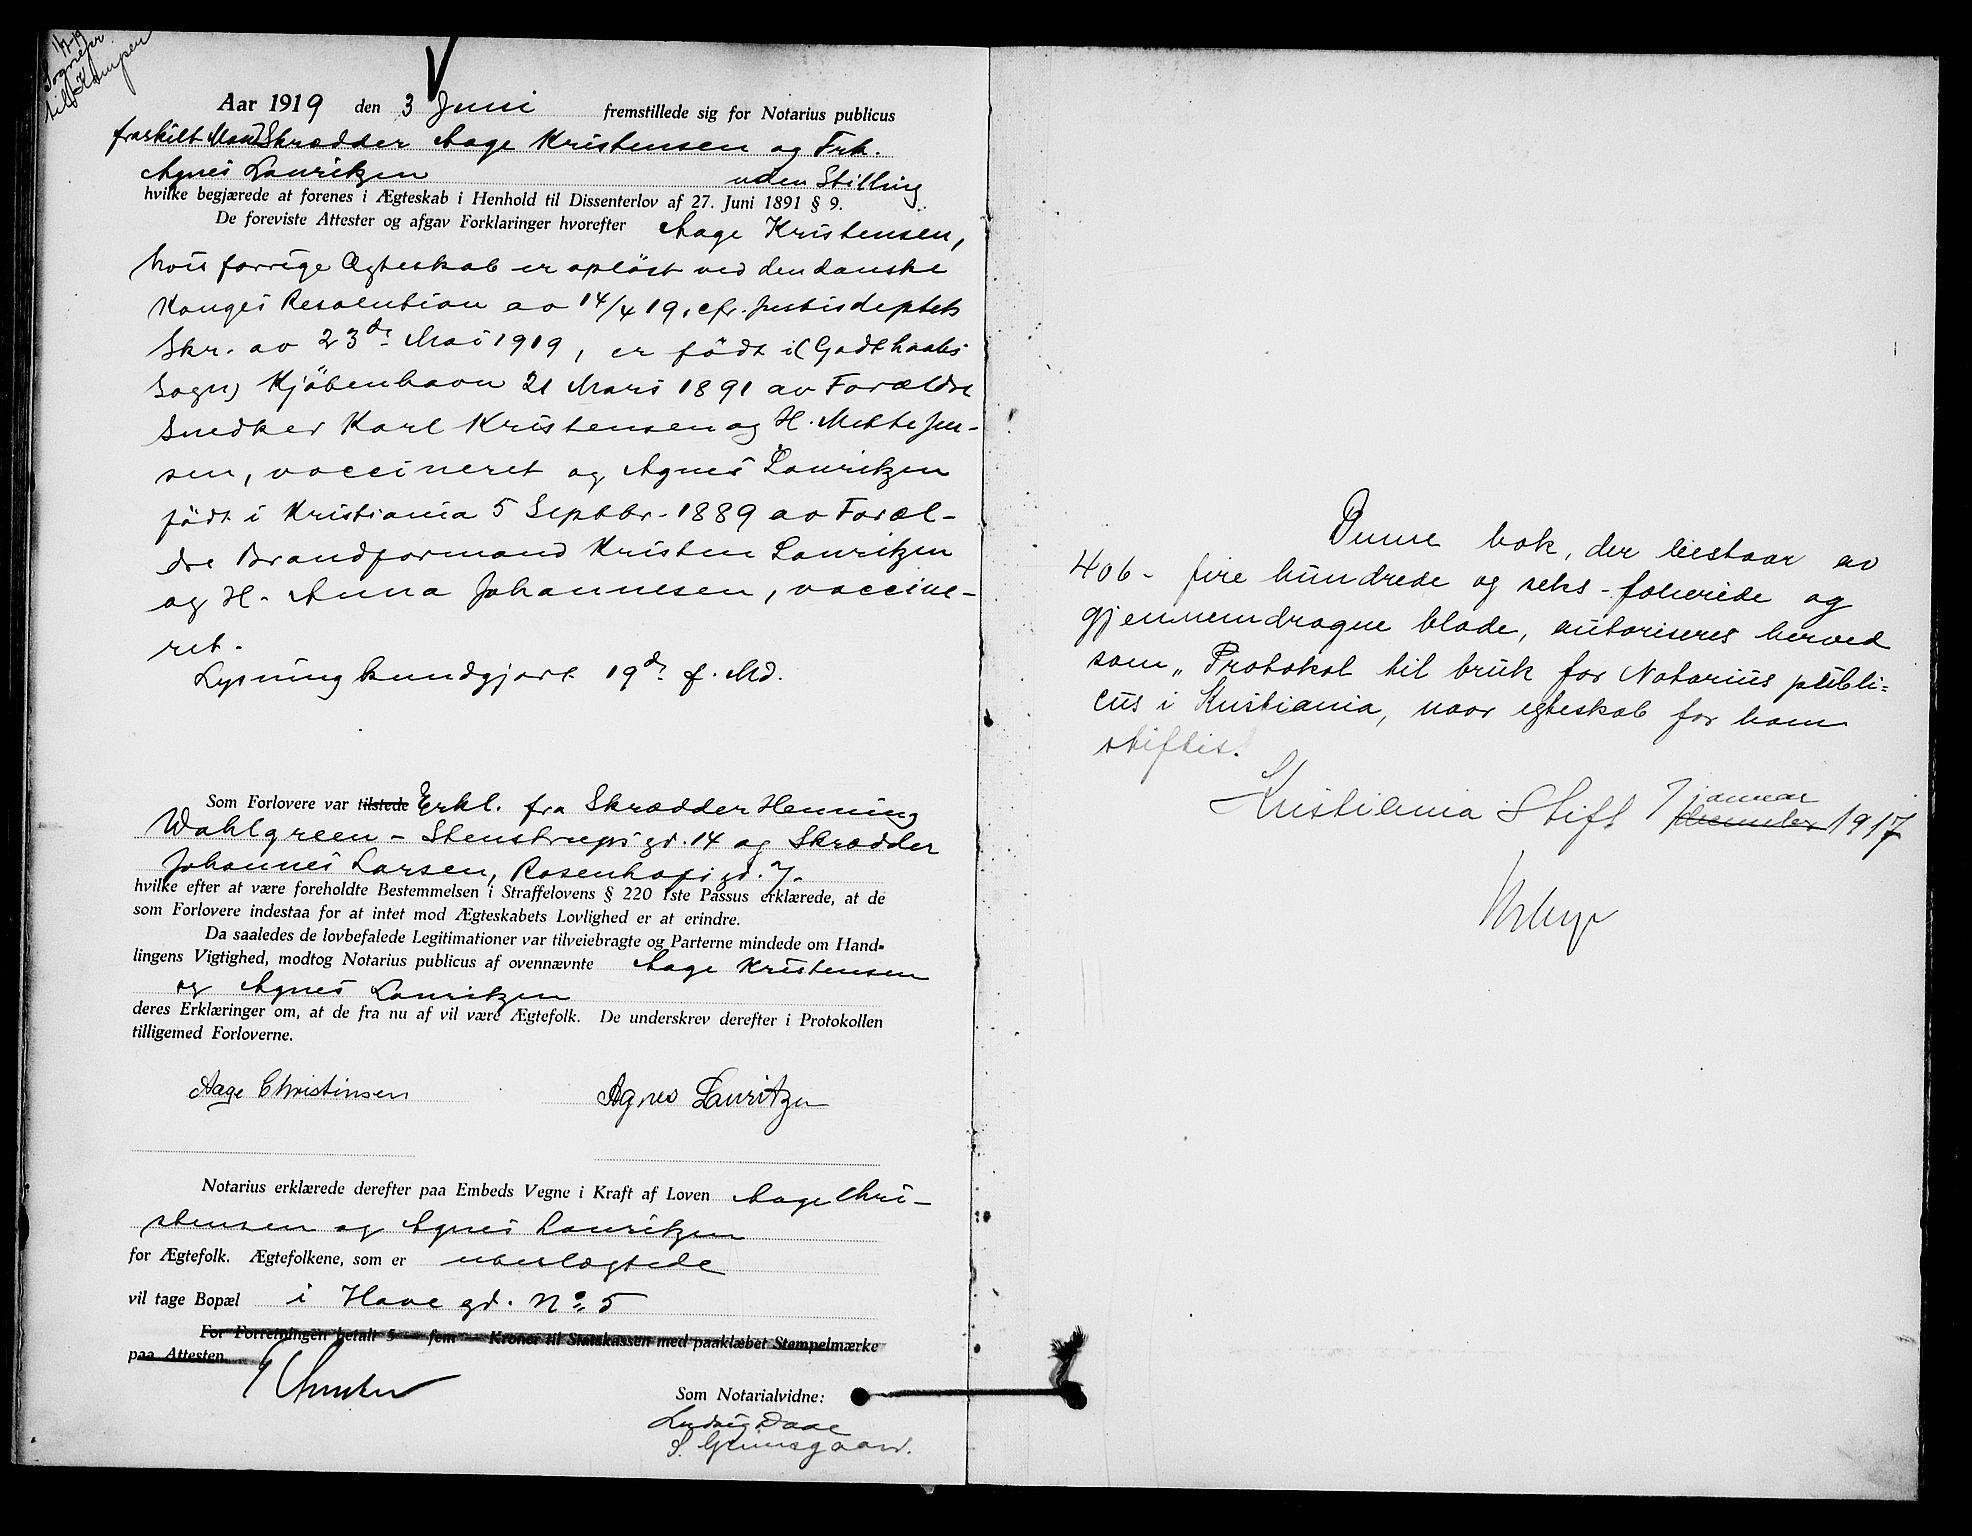 SAO, Oslo byfogd avd. I, L/Lb/Lbb/L0012: Notarialprotokoll, rekke II: Vigsler, 1918-1919, s. 406b-407a